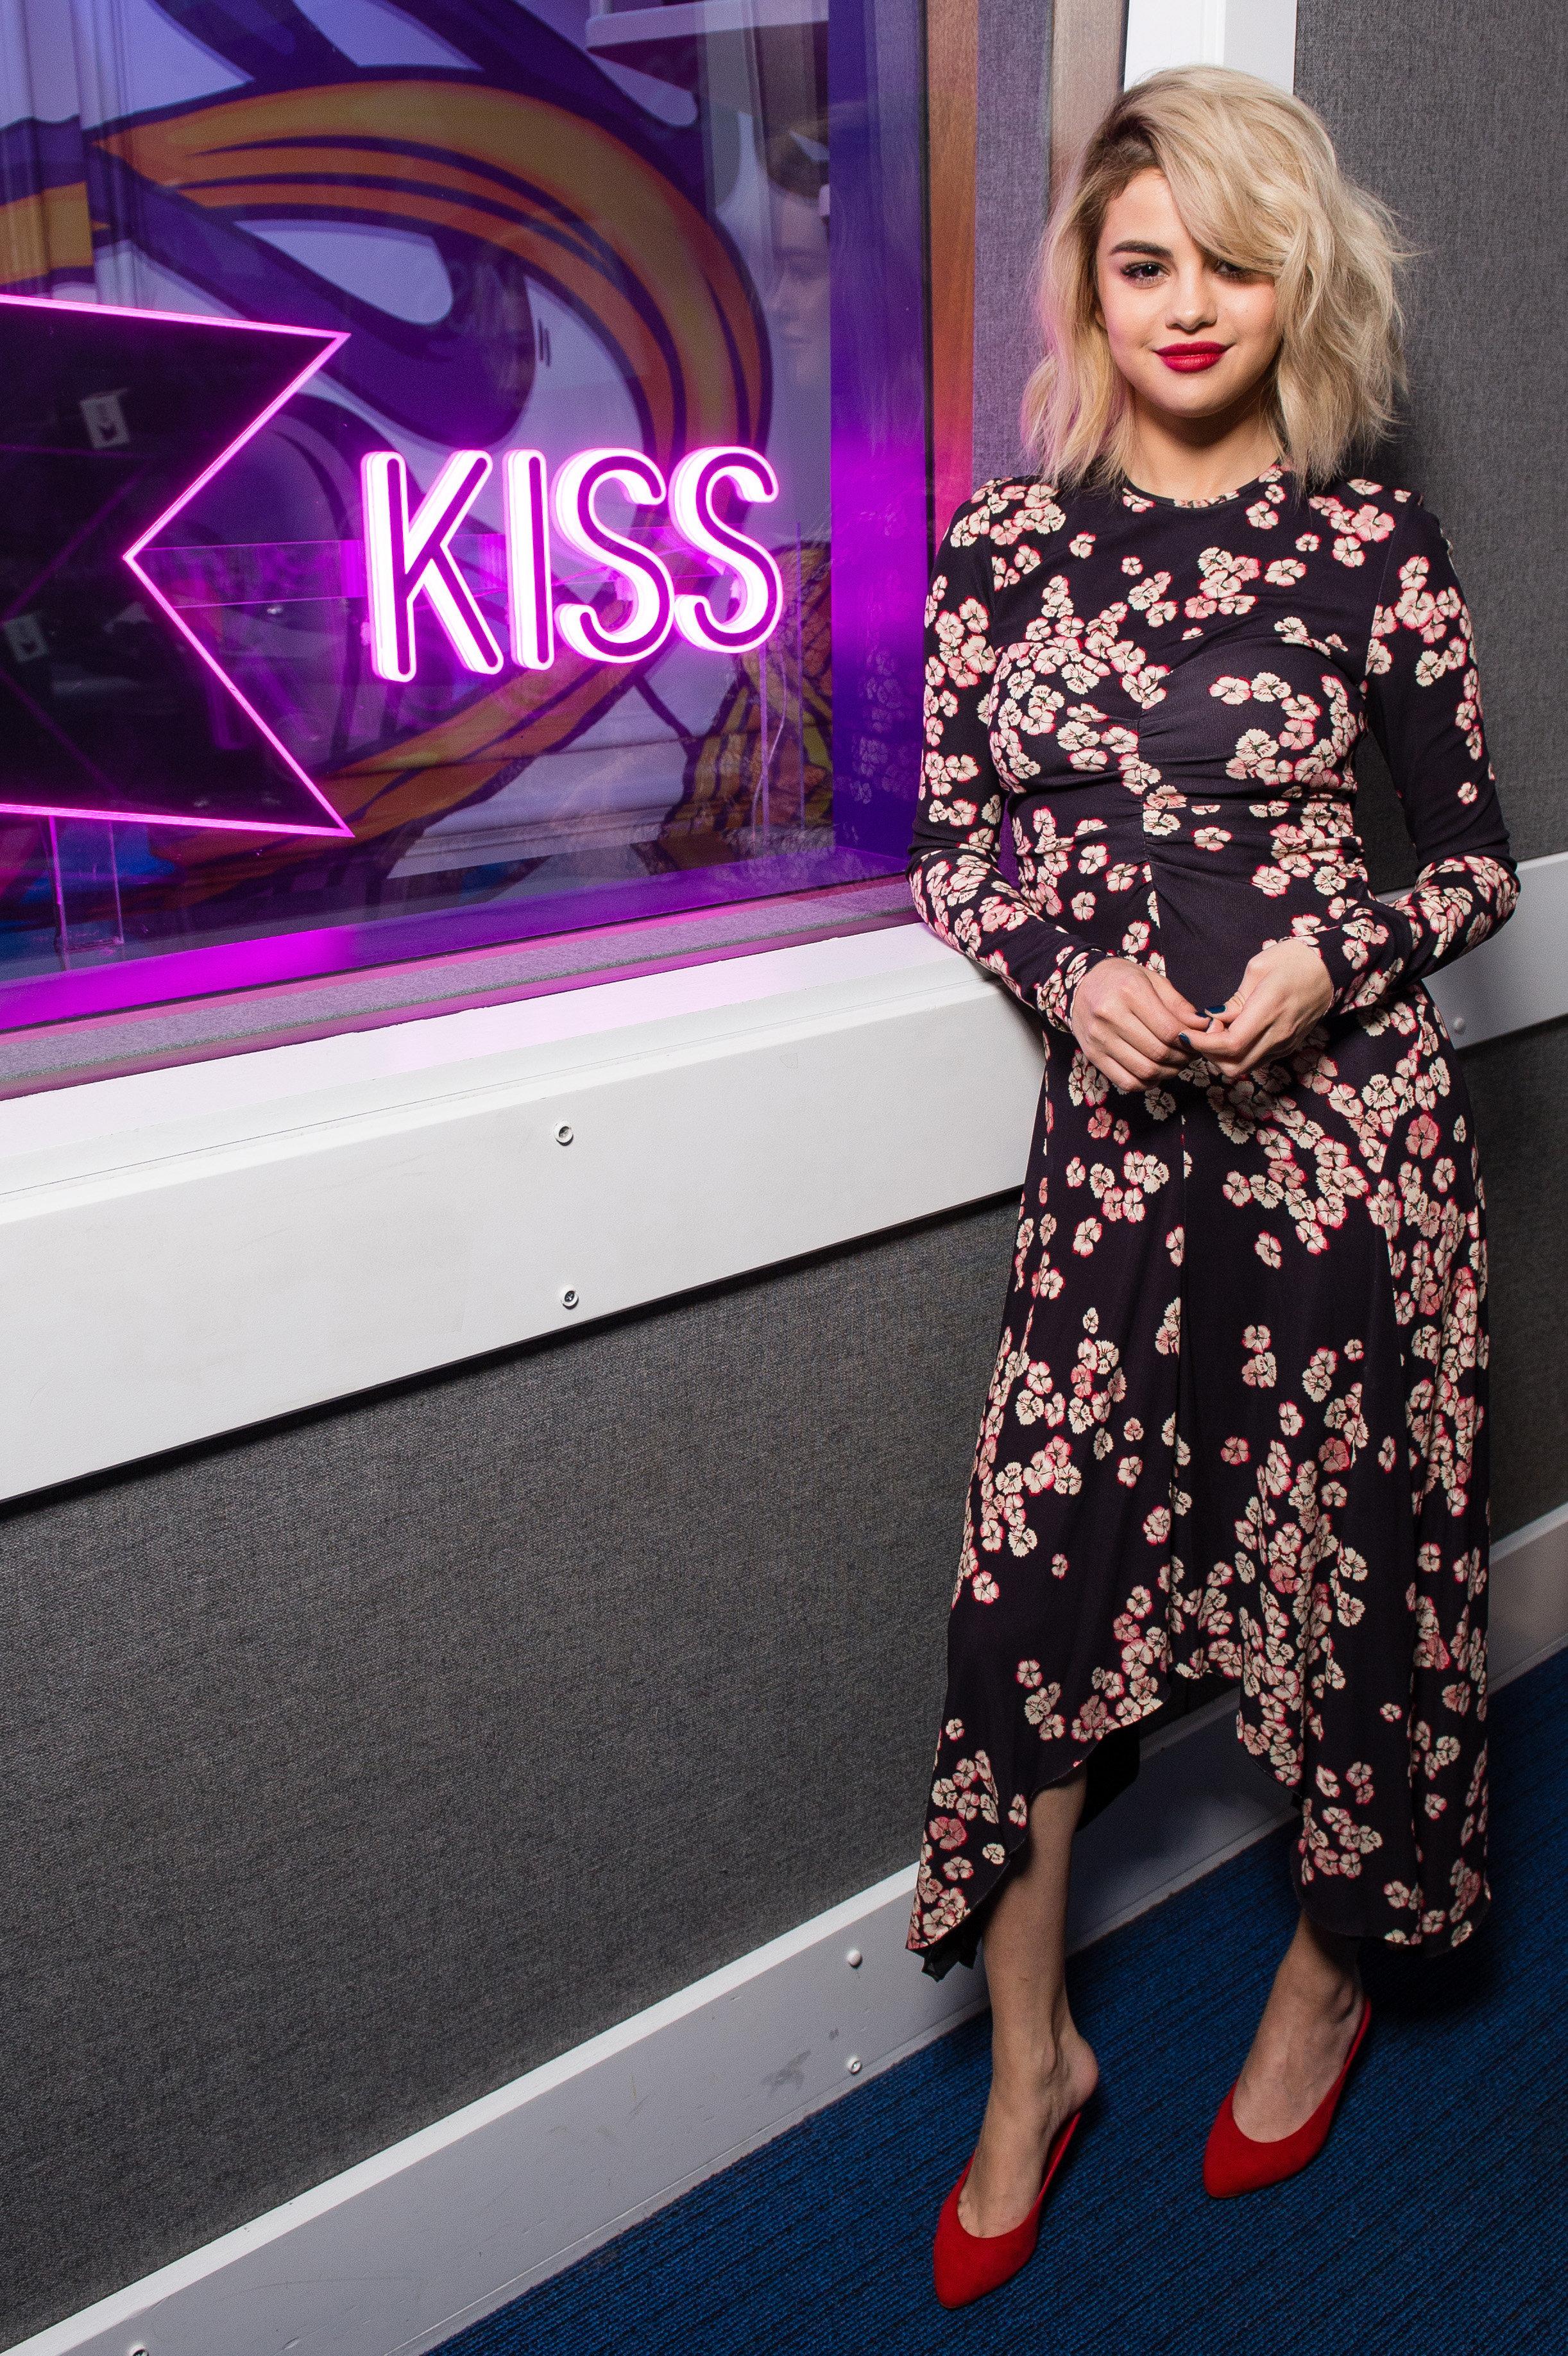 Gomez at KISS FM's studios on Dec. 4.